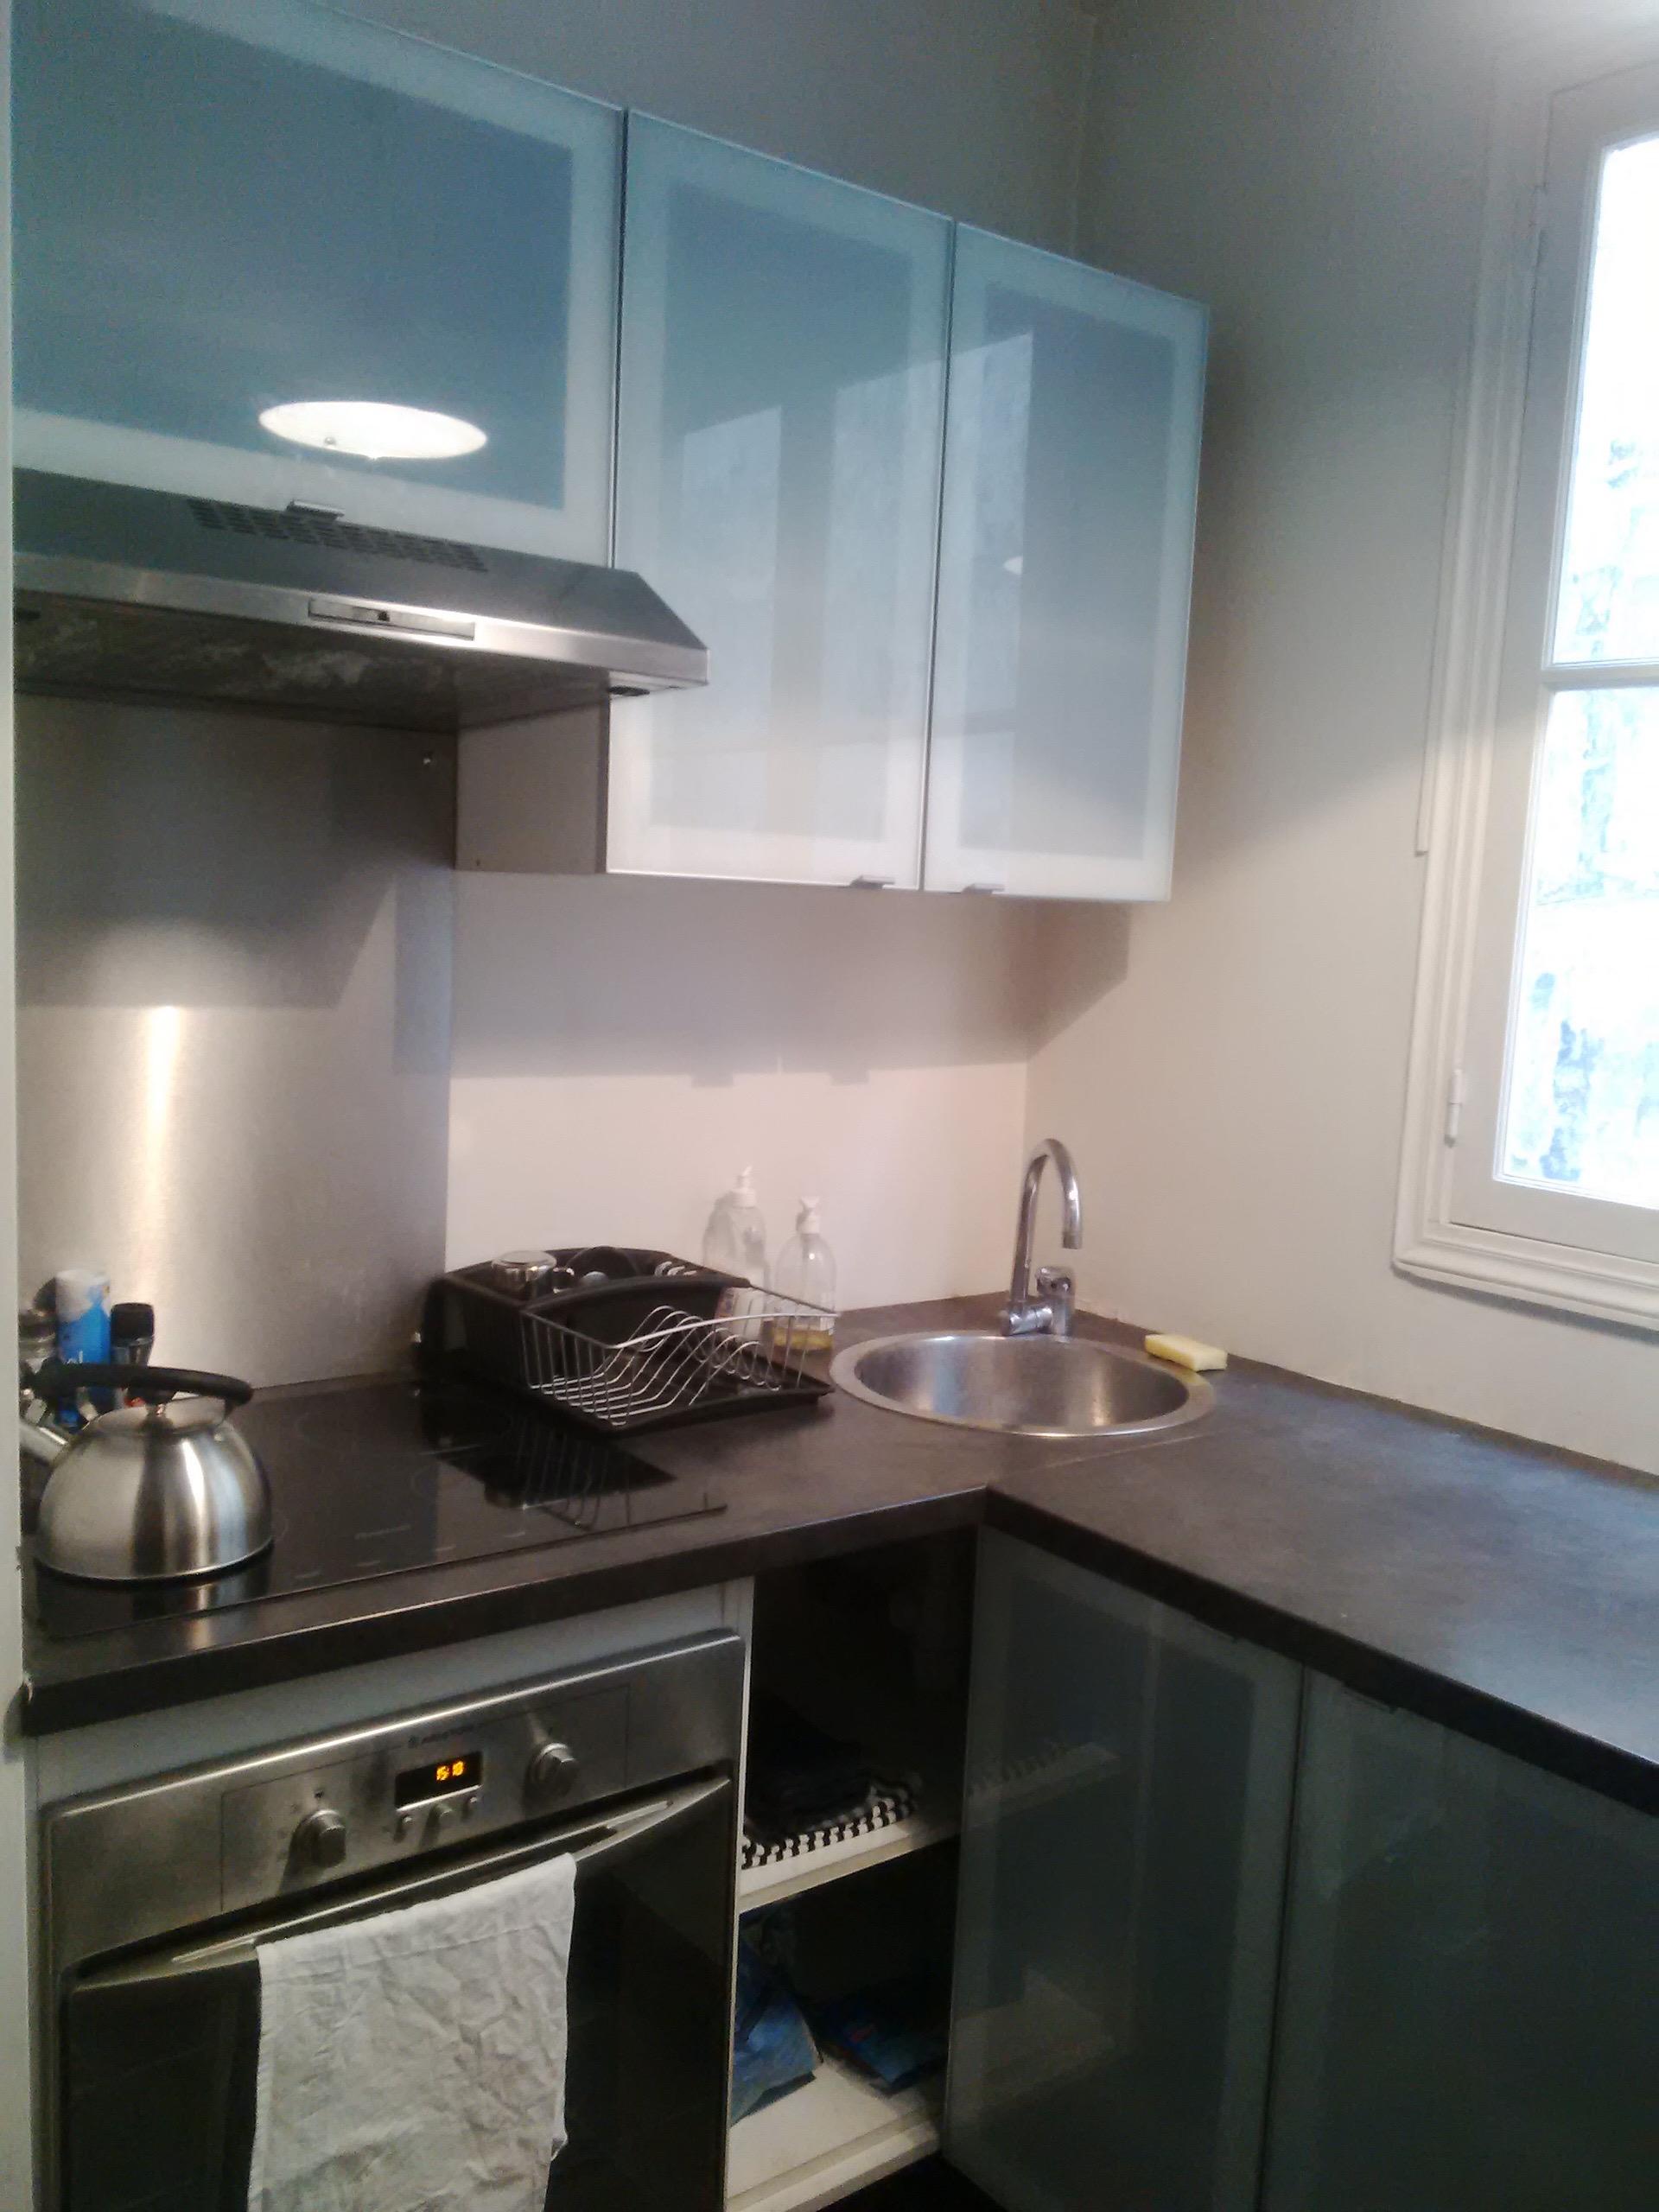 Amenager cuisine 6m2 21 meuble tv en placo mulhouse for Cuisine 4m2 ikea